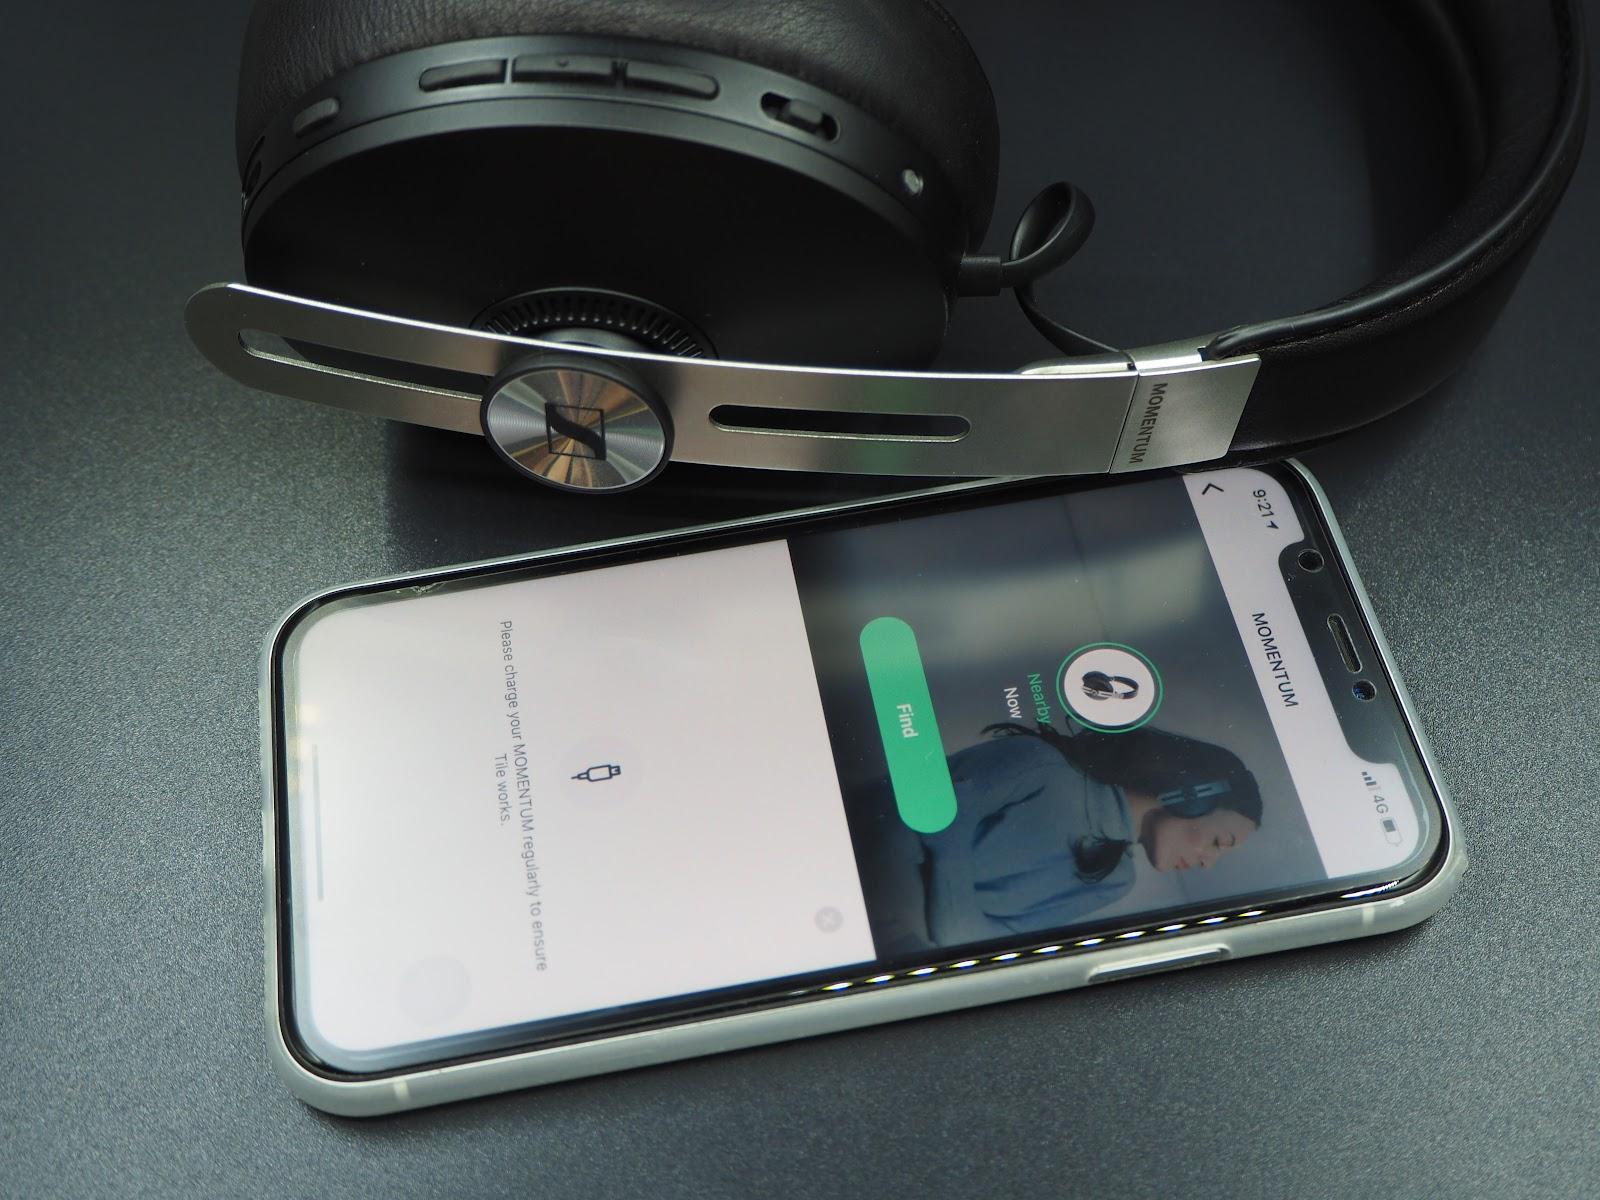 TILE smartphone application